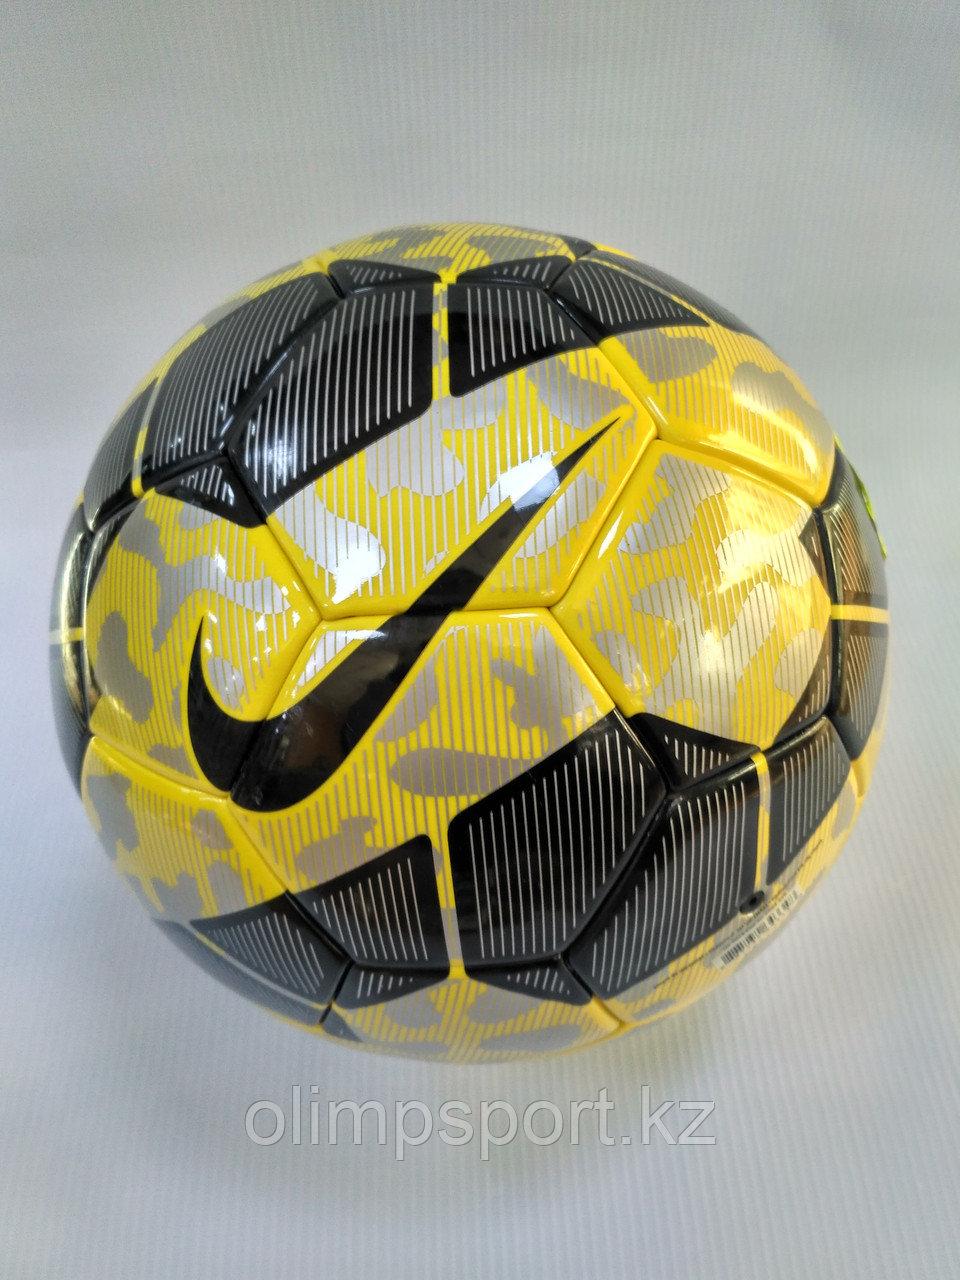 Мяч футзальный (мини футбол) Nike Rolinho Clube